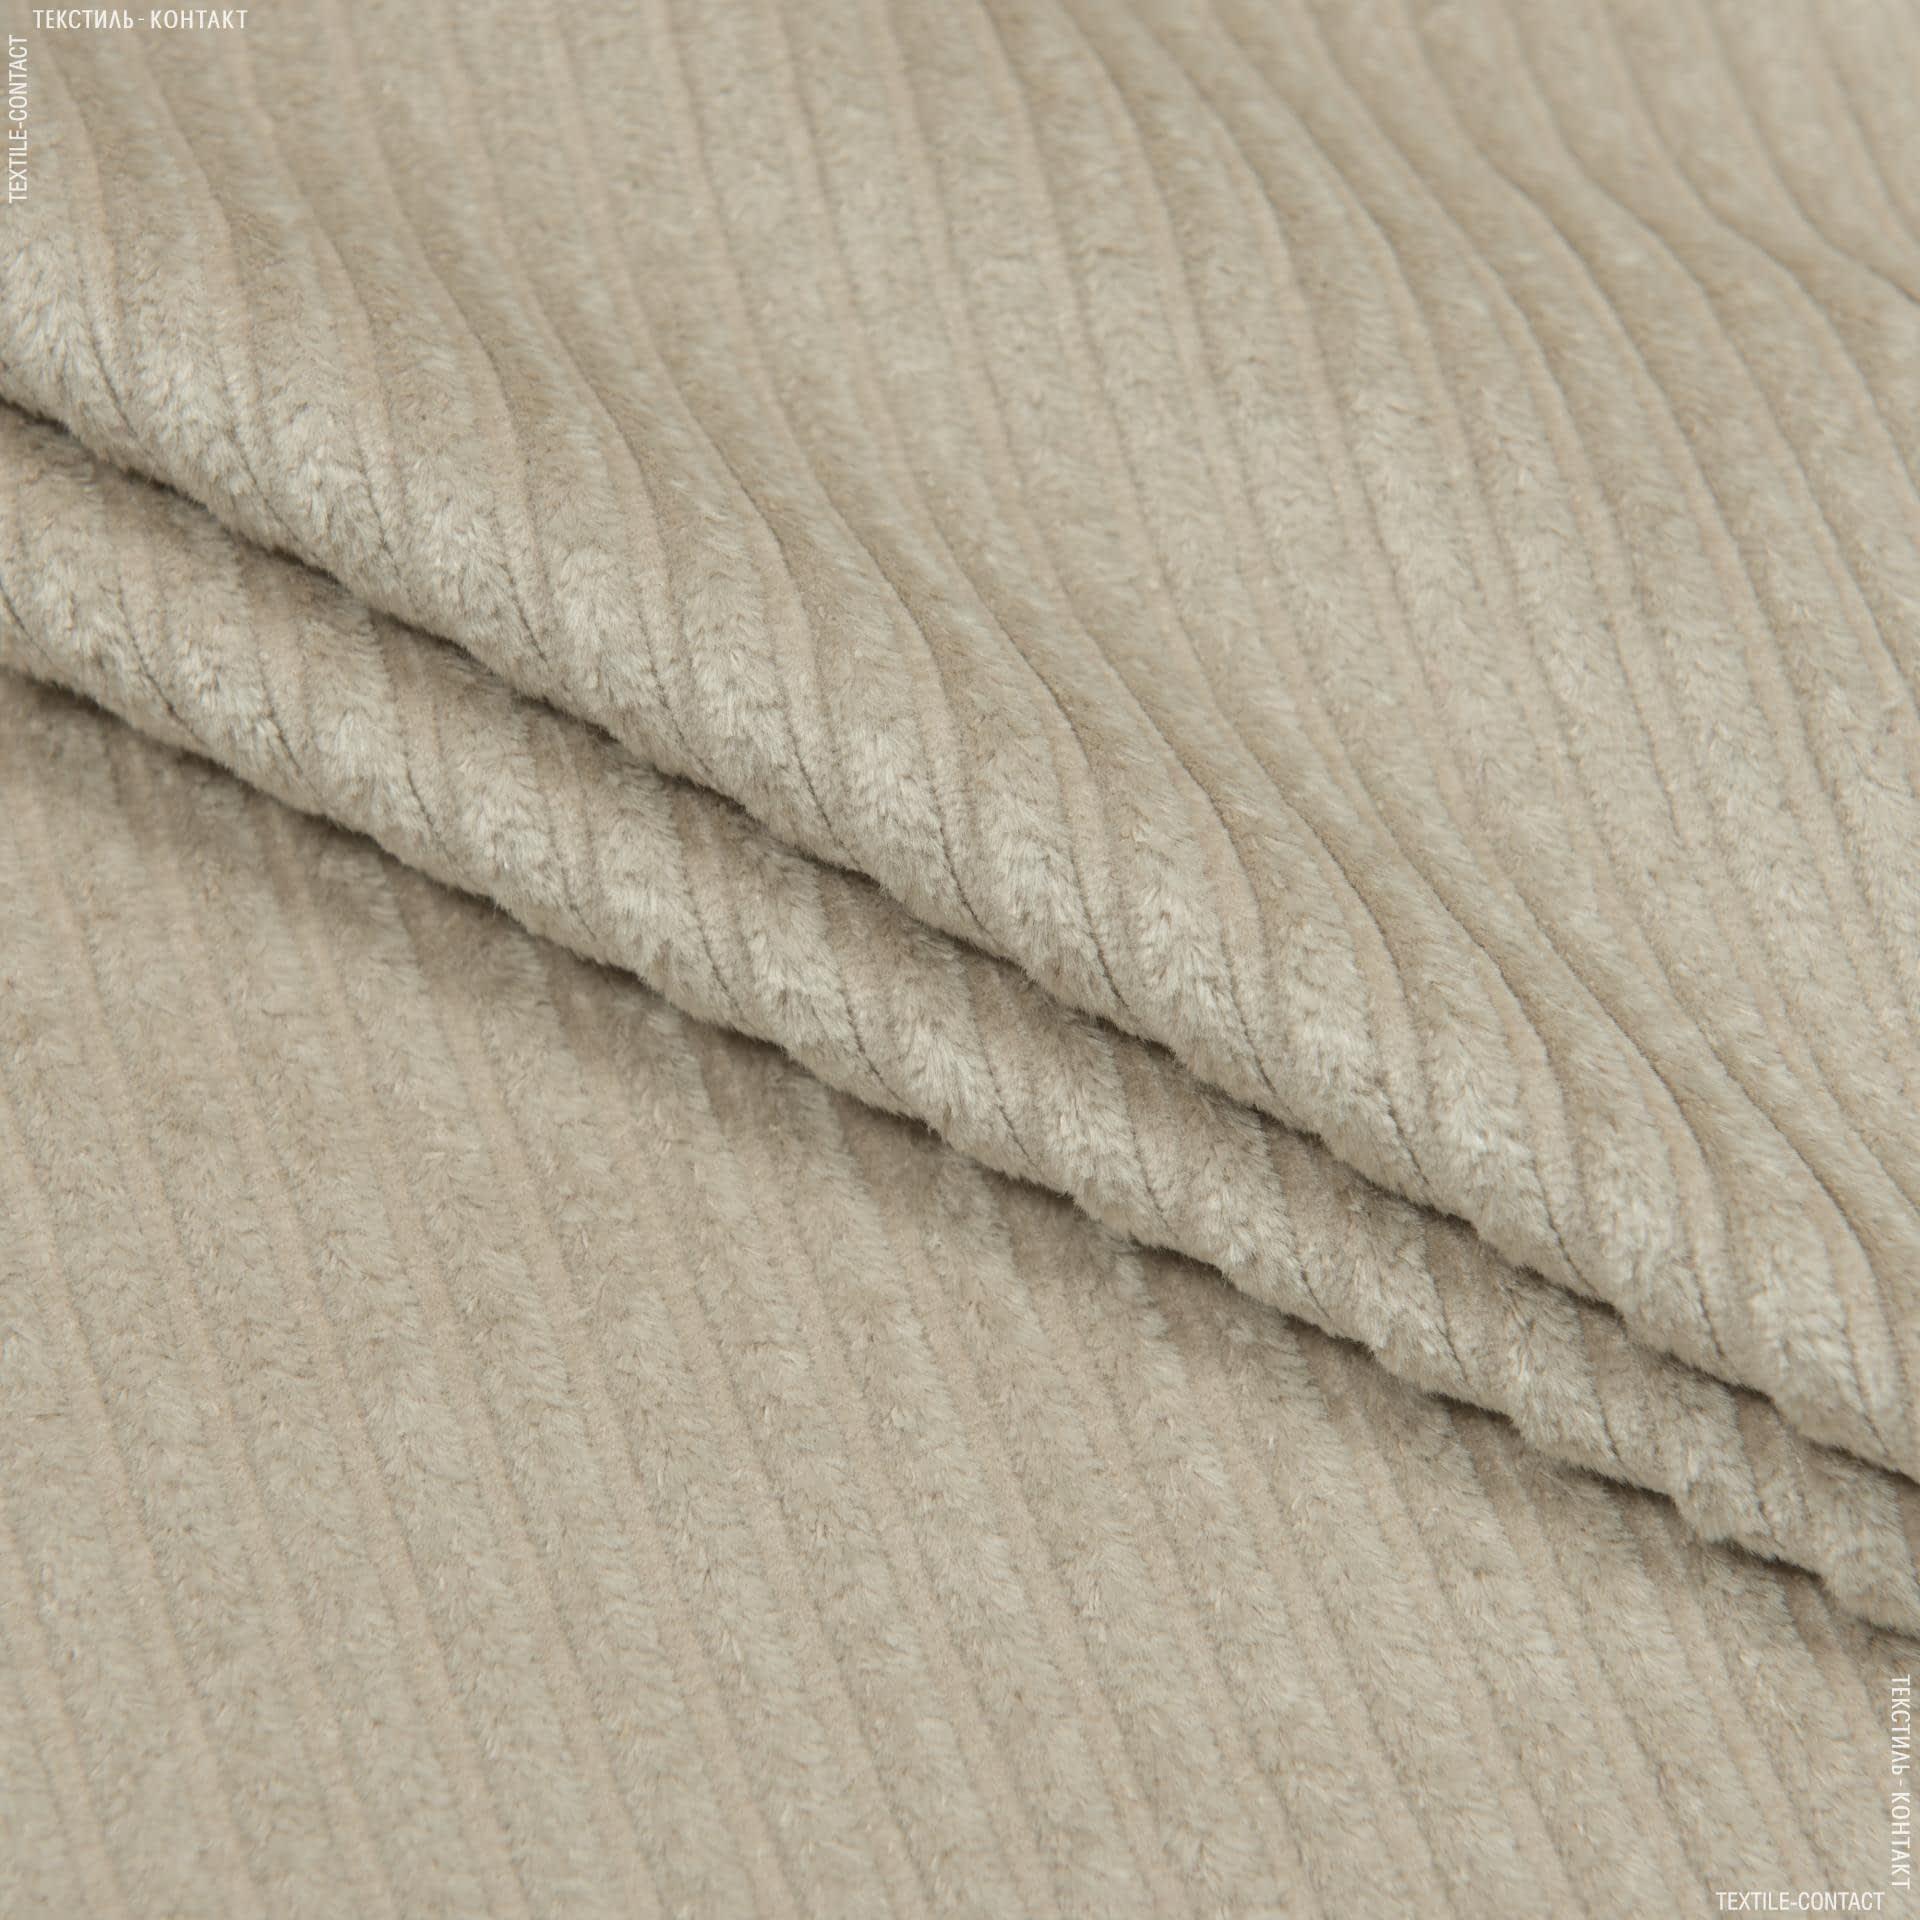 Тканини для верхнього одягу - Вельвет широкий бежевий